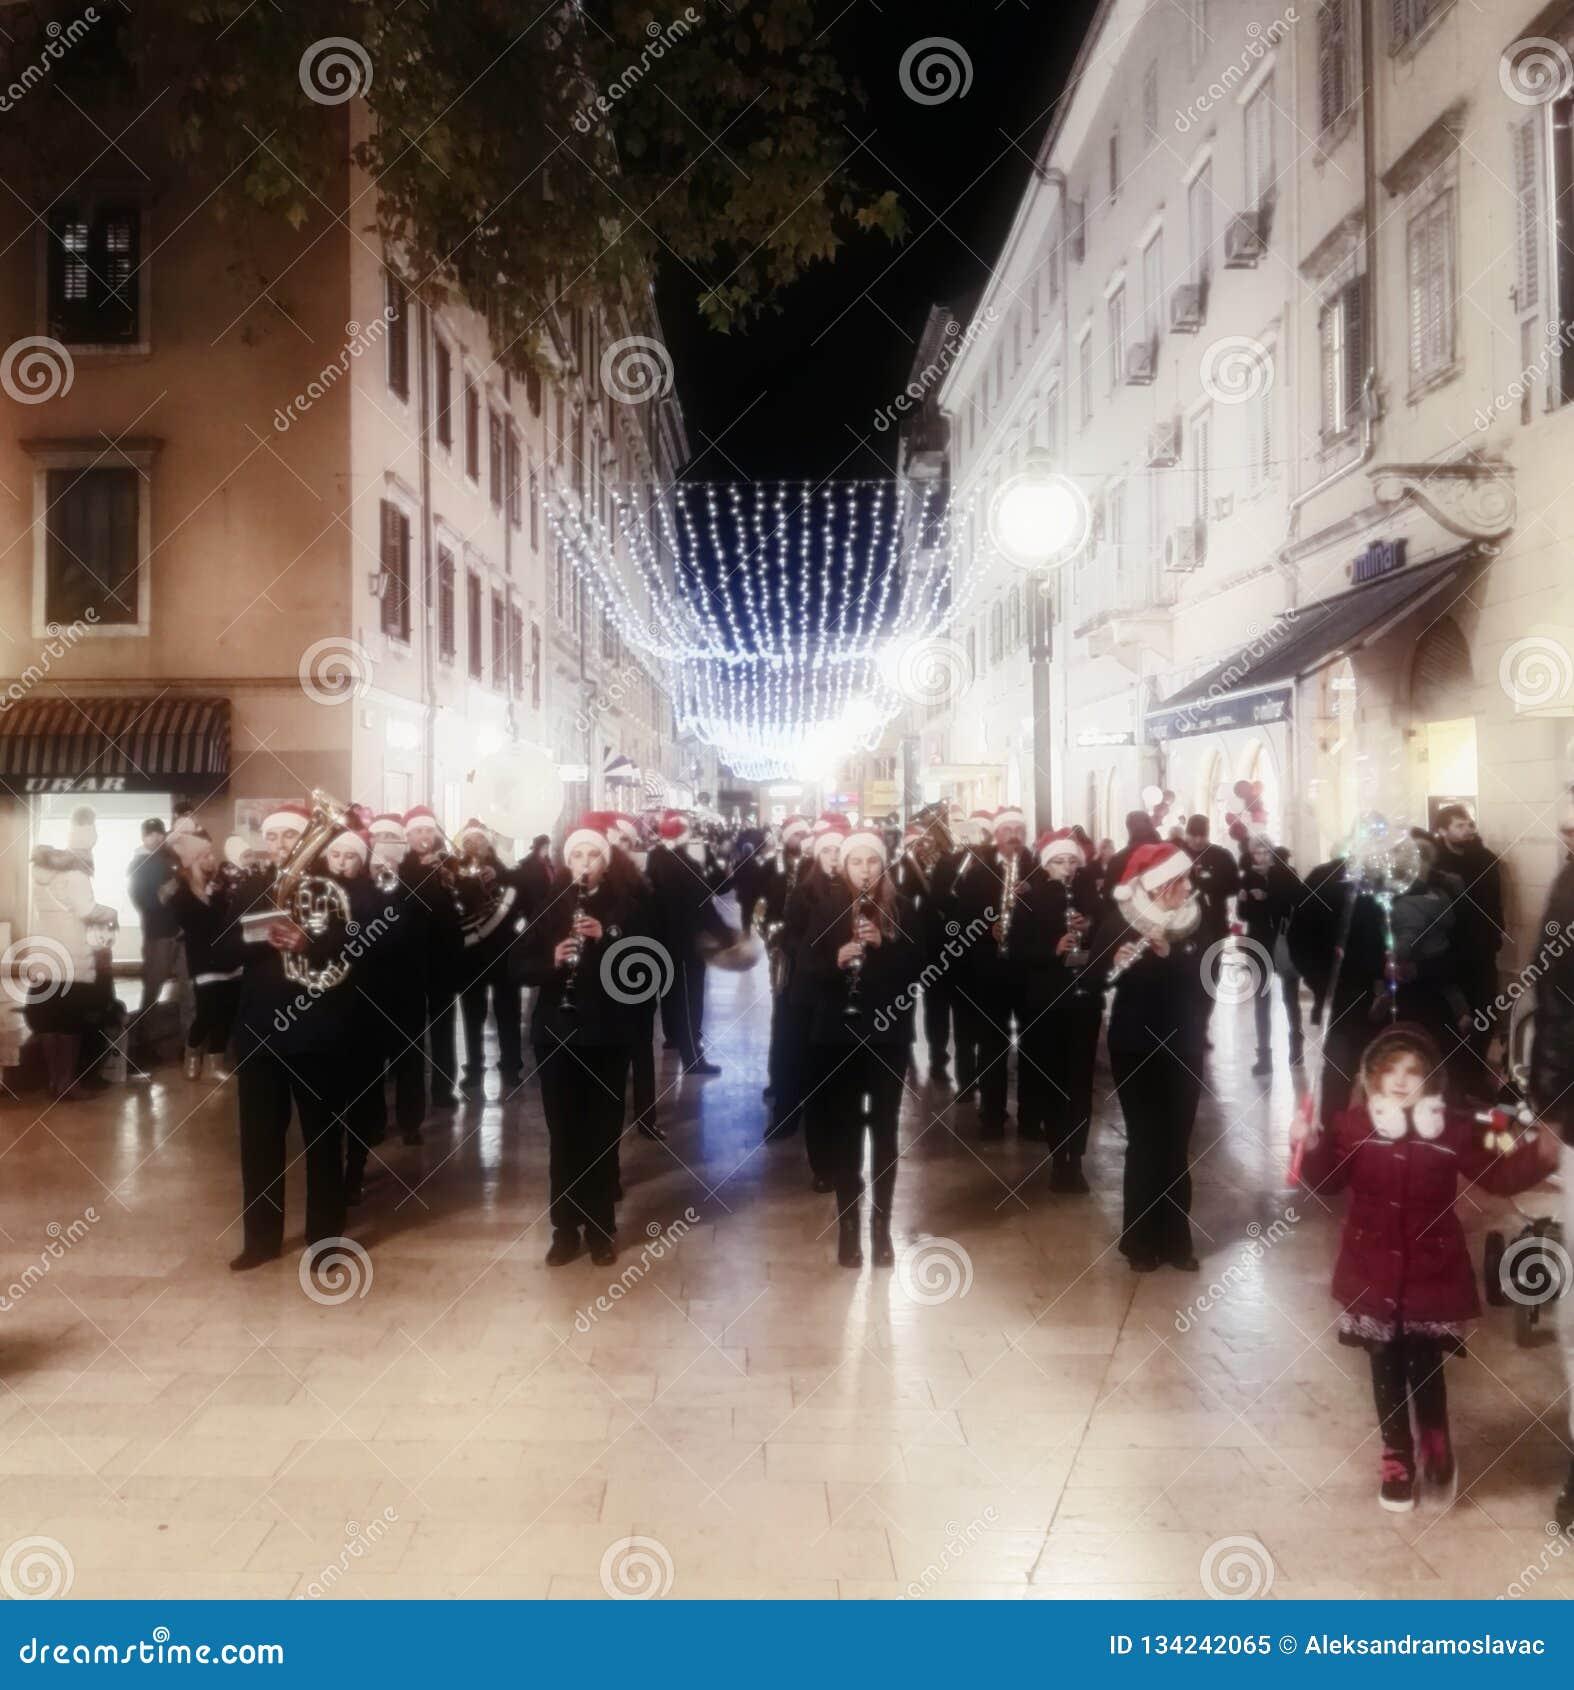 Rijeka, Κροατία, στις 12 Δεκεμβρίου 2018 Μουσικοί στην οδό της κροατικής πόλης Rijeka στο χρόνο Χριστουγέννων